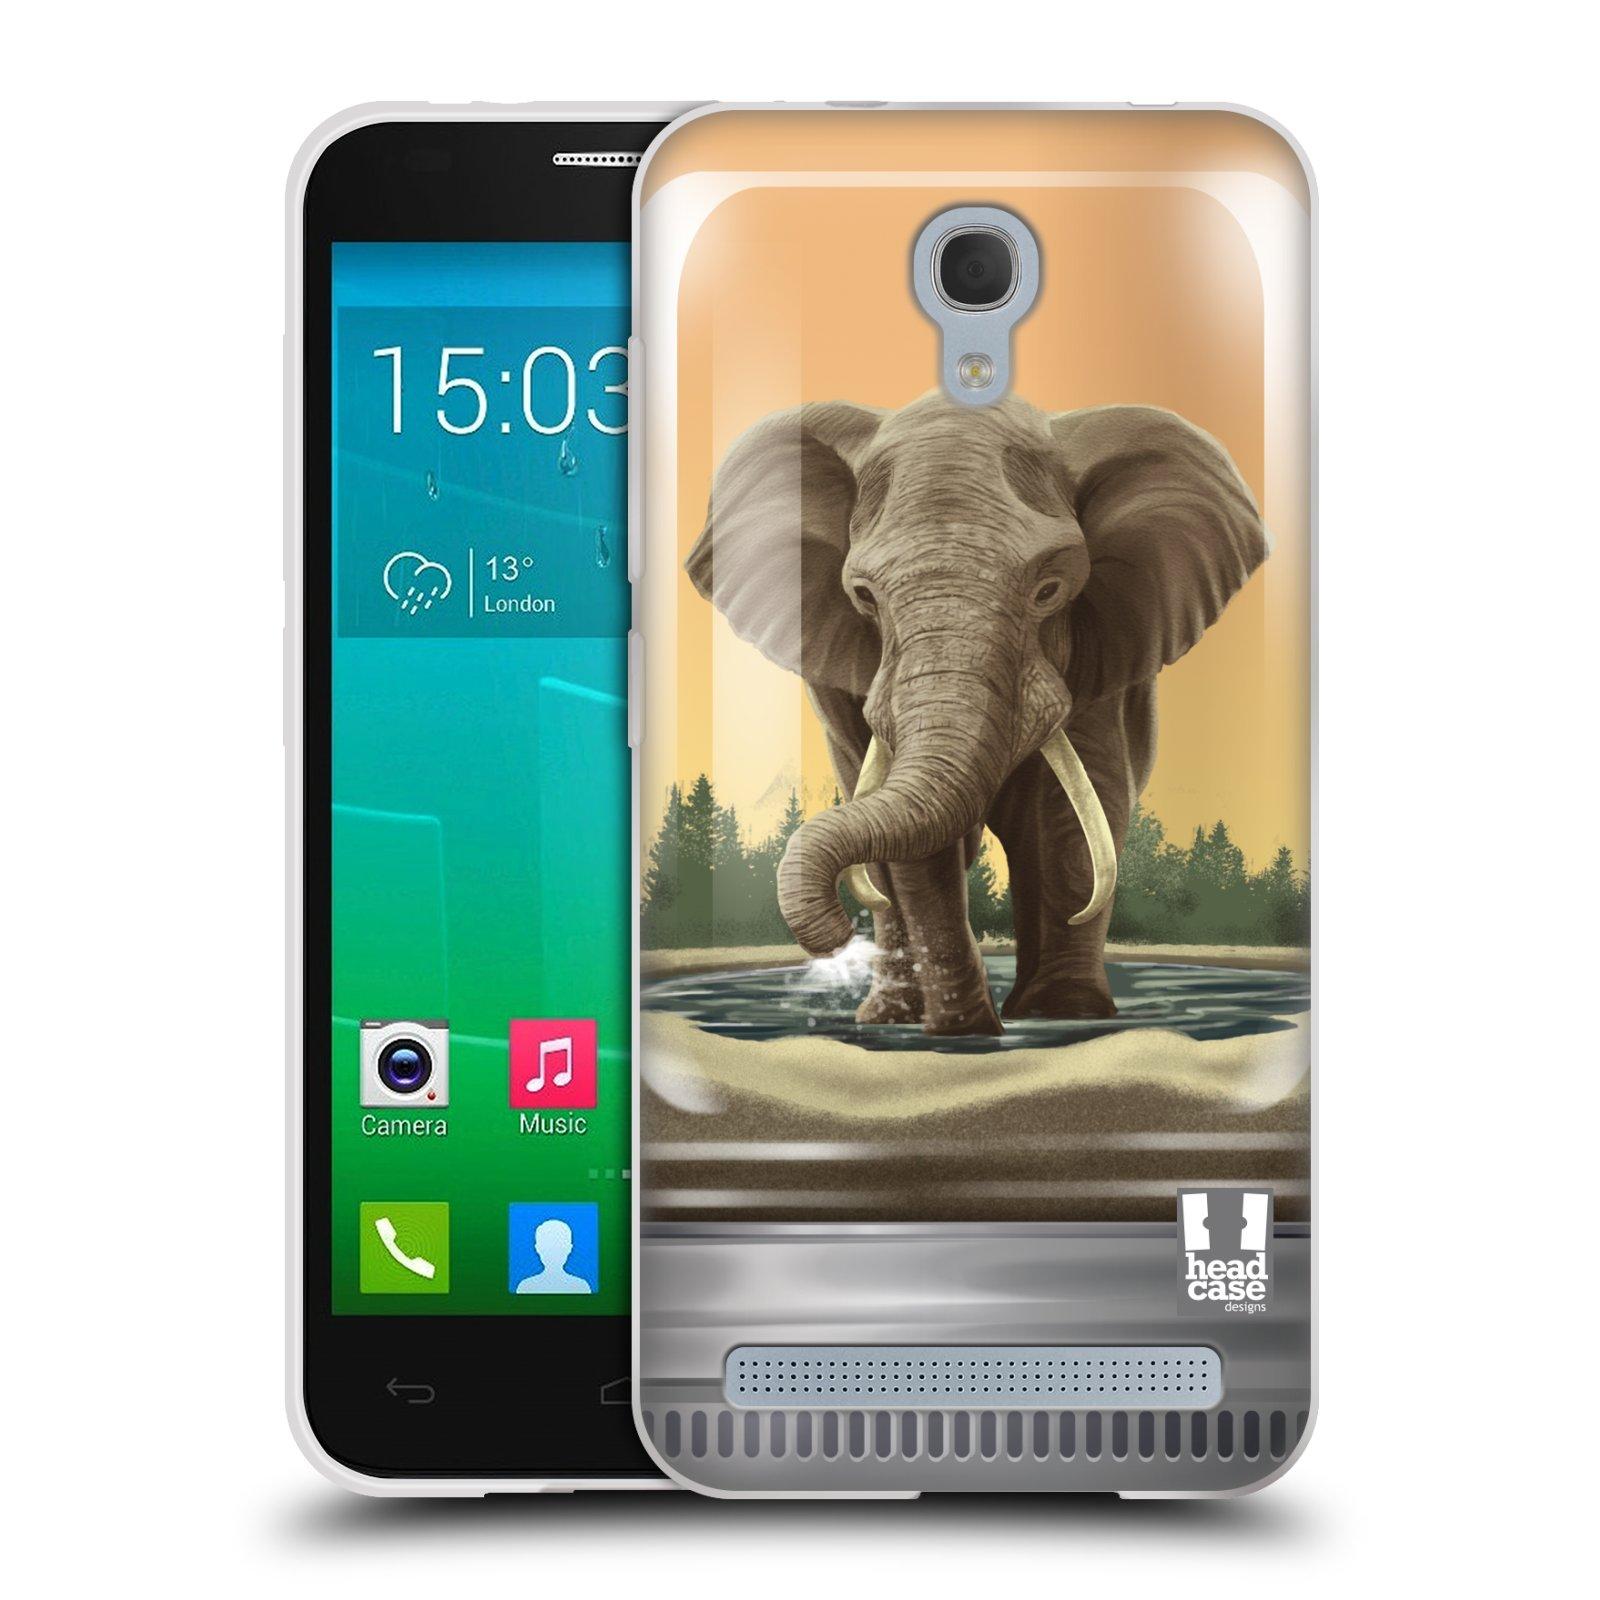 HEAD CASE silikonový obal na mobil Alcatel Idol 2 MINI S 6036Y vzor Zvířátka v těžítku slon